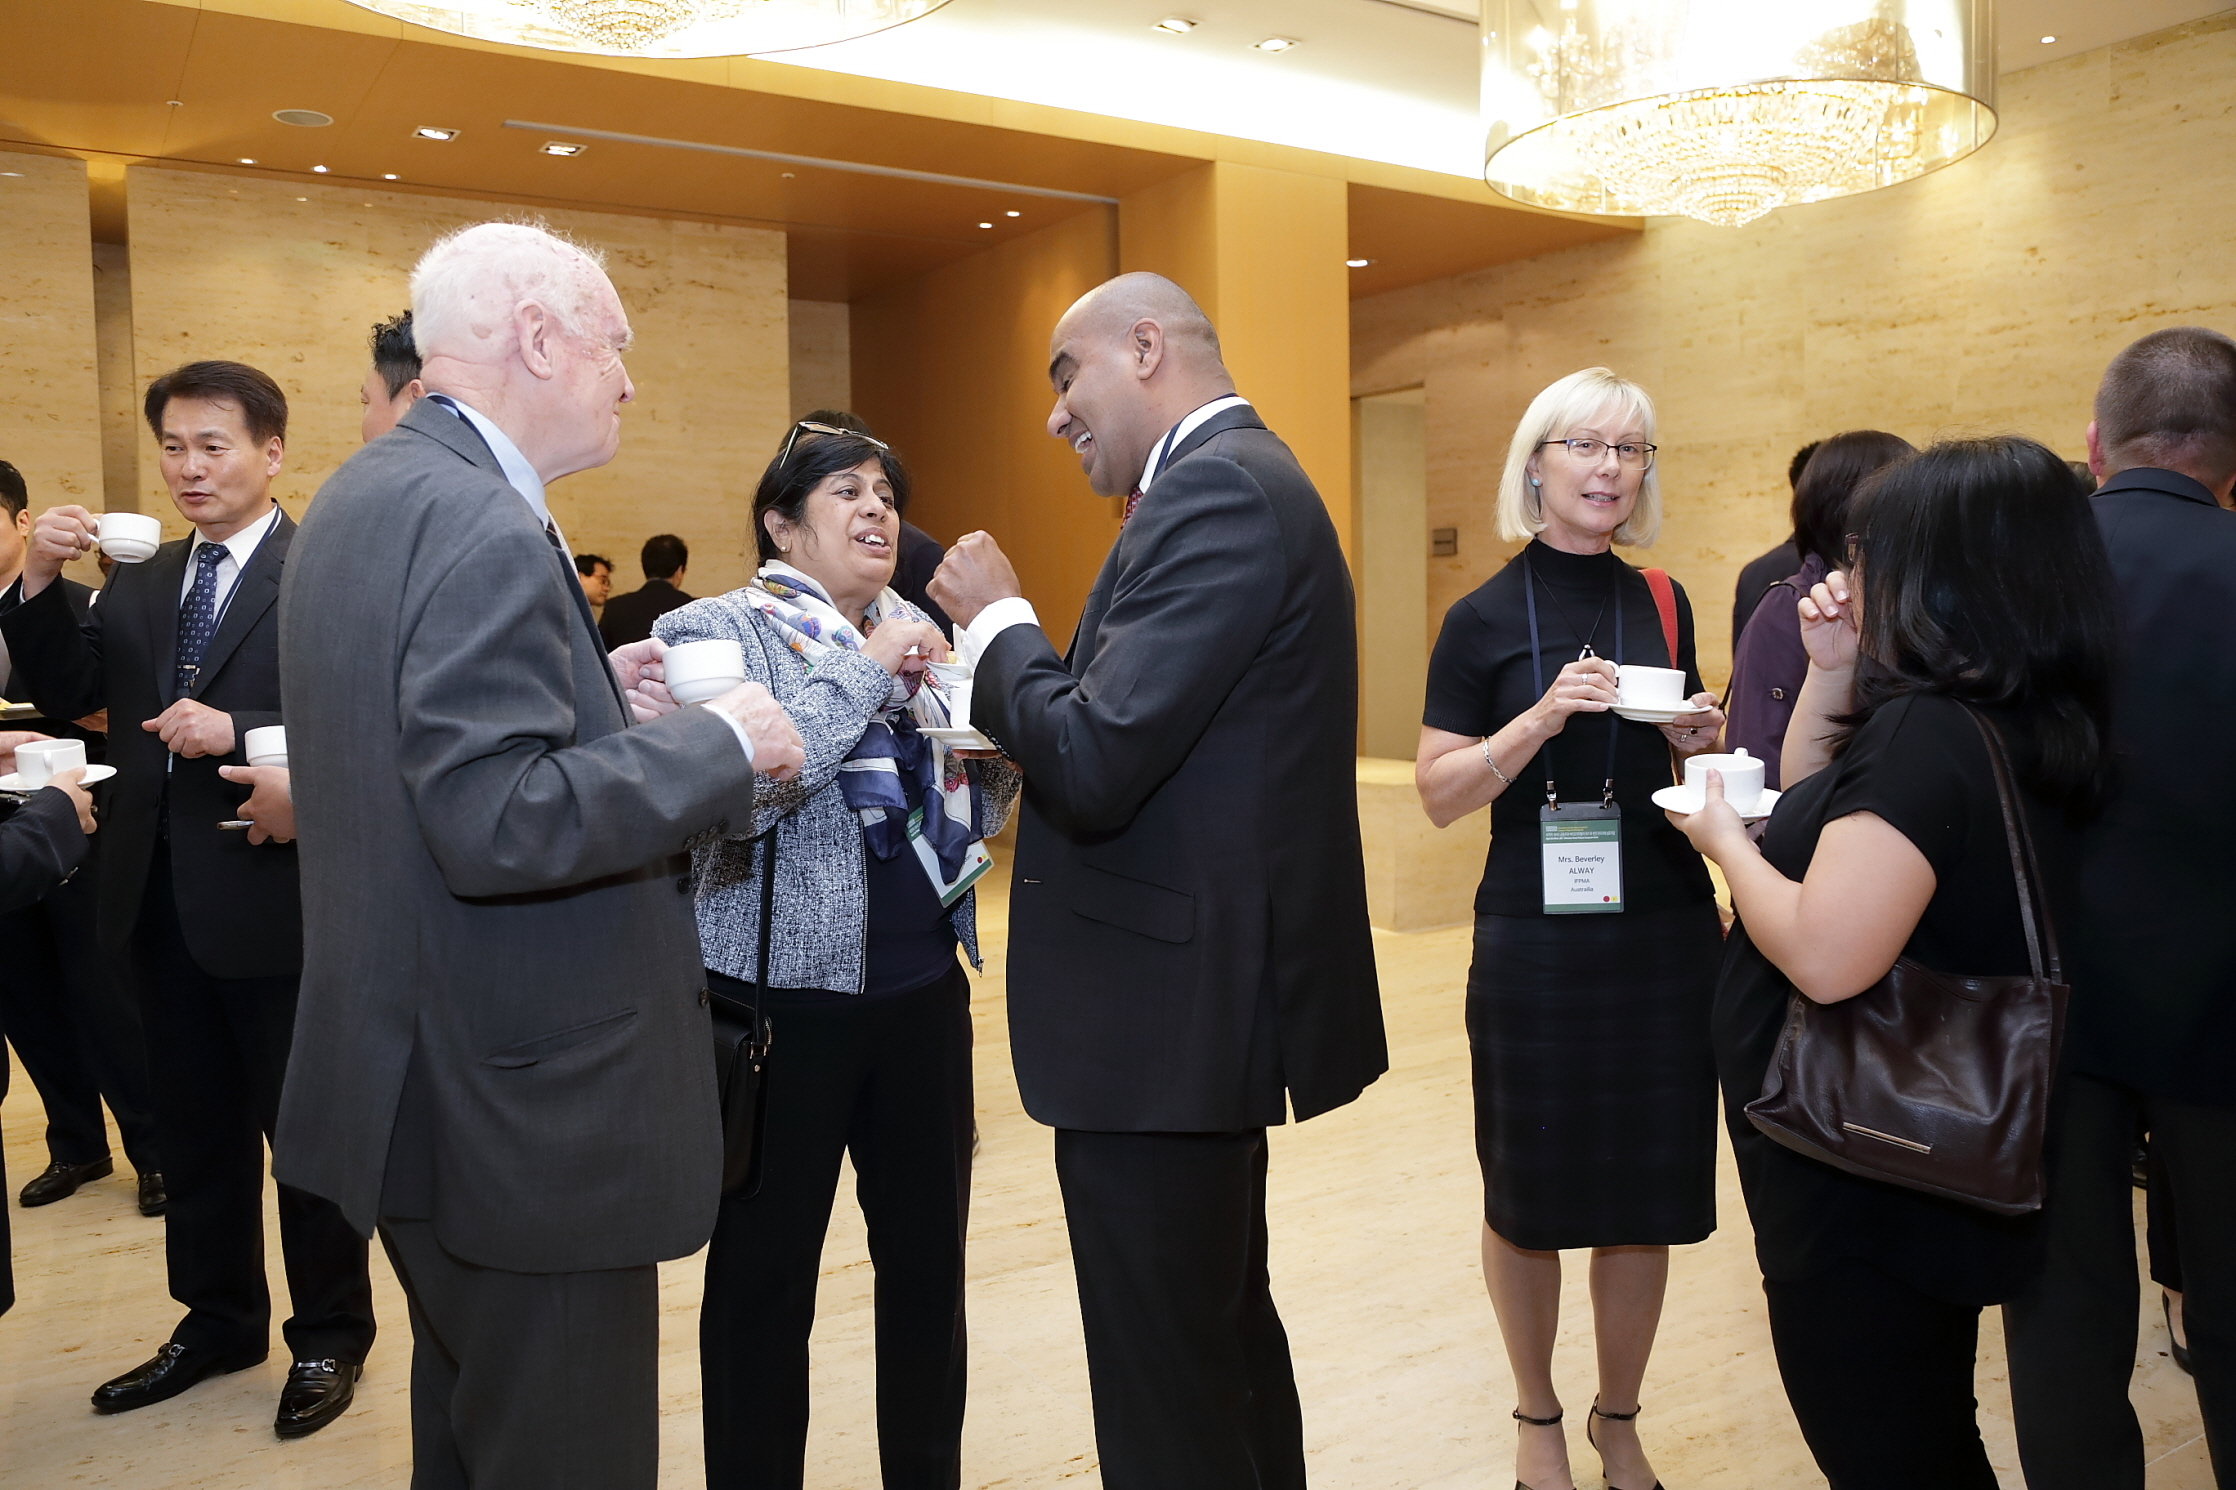 International Symposium on Procedure